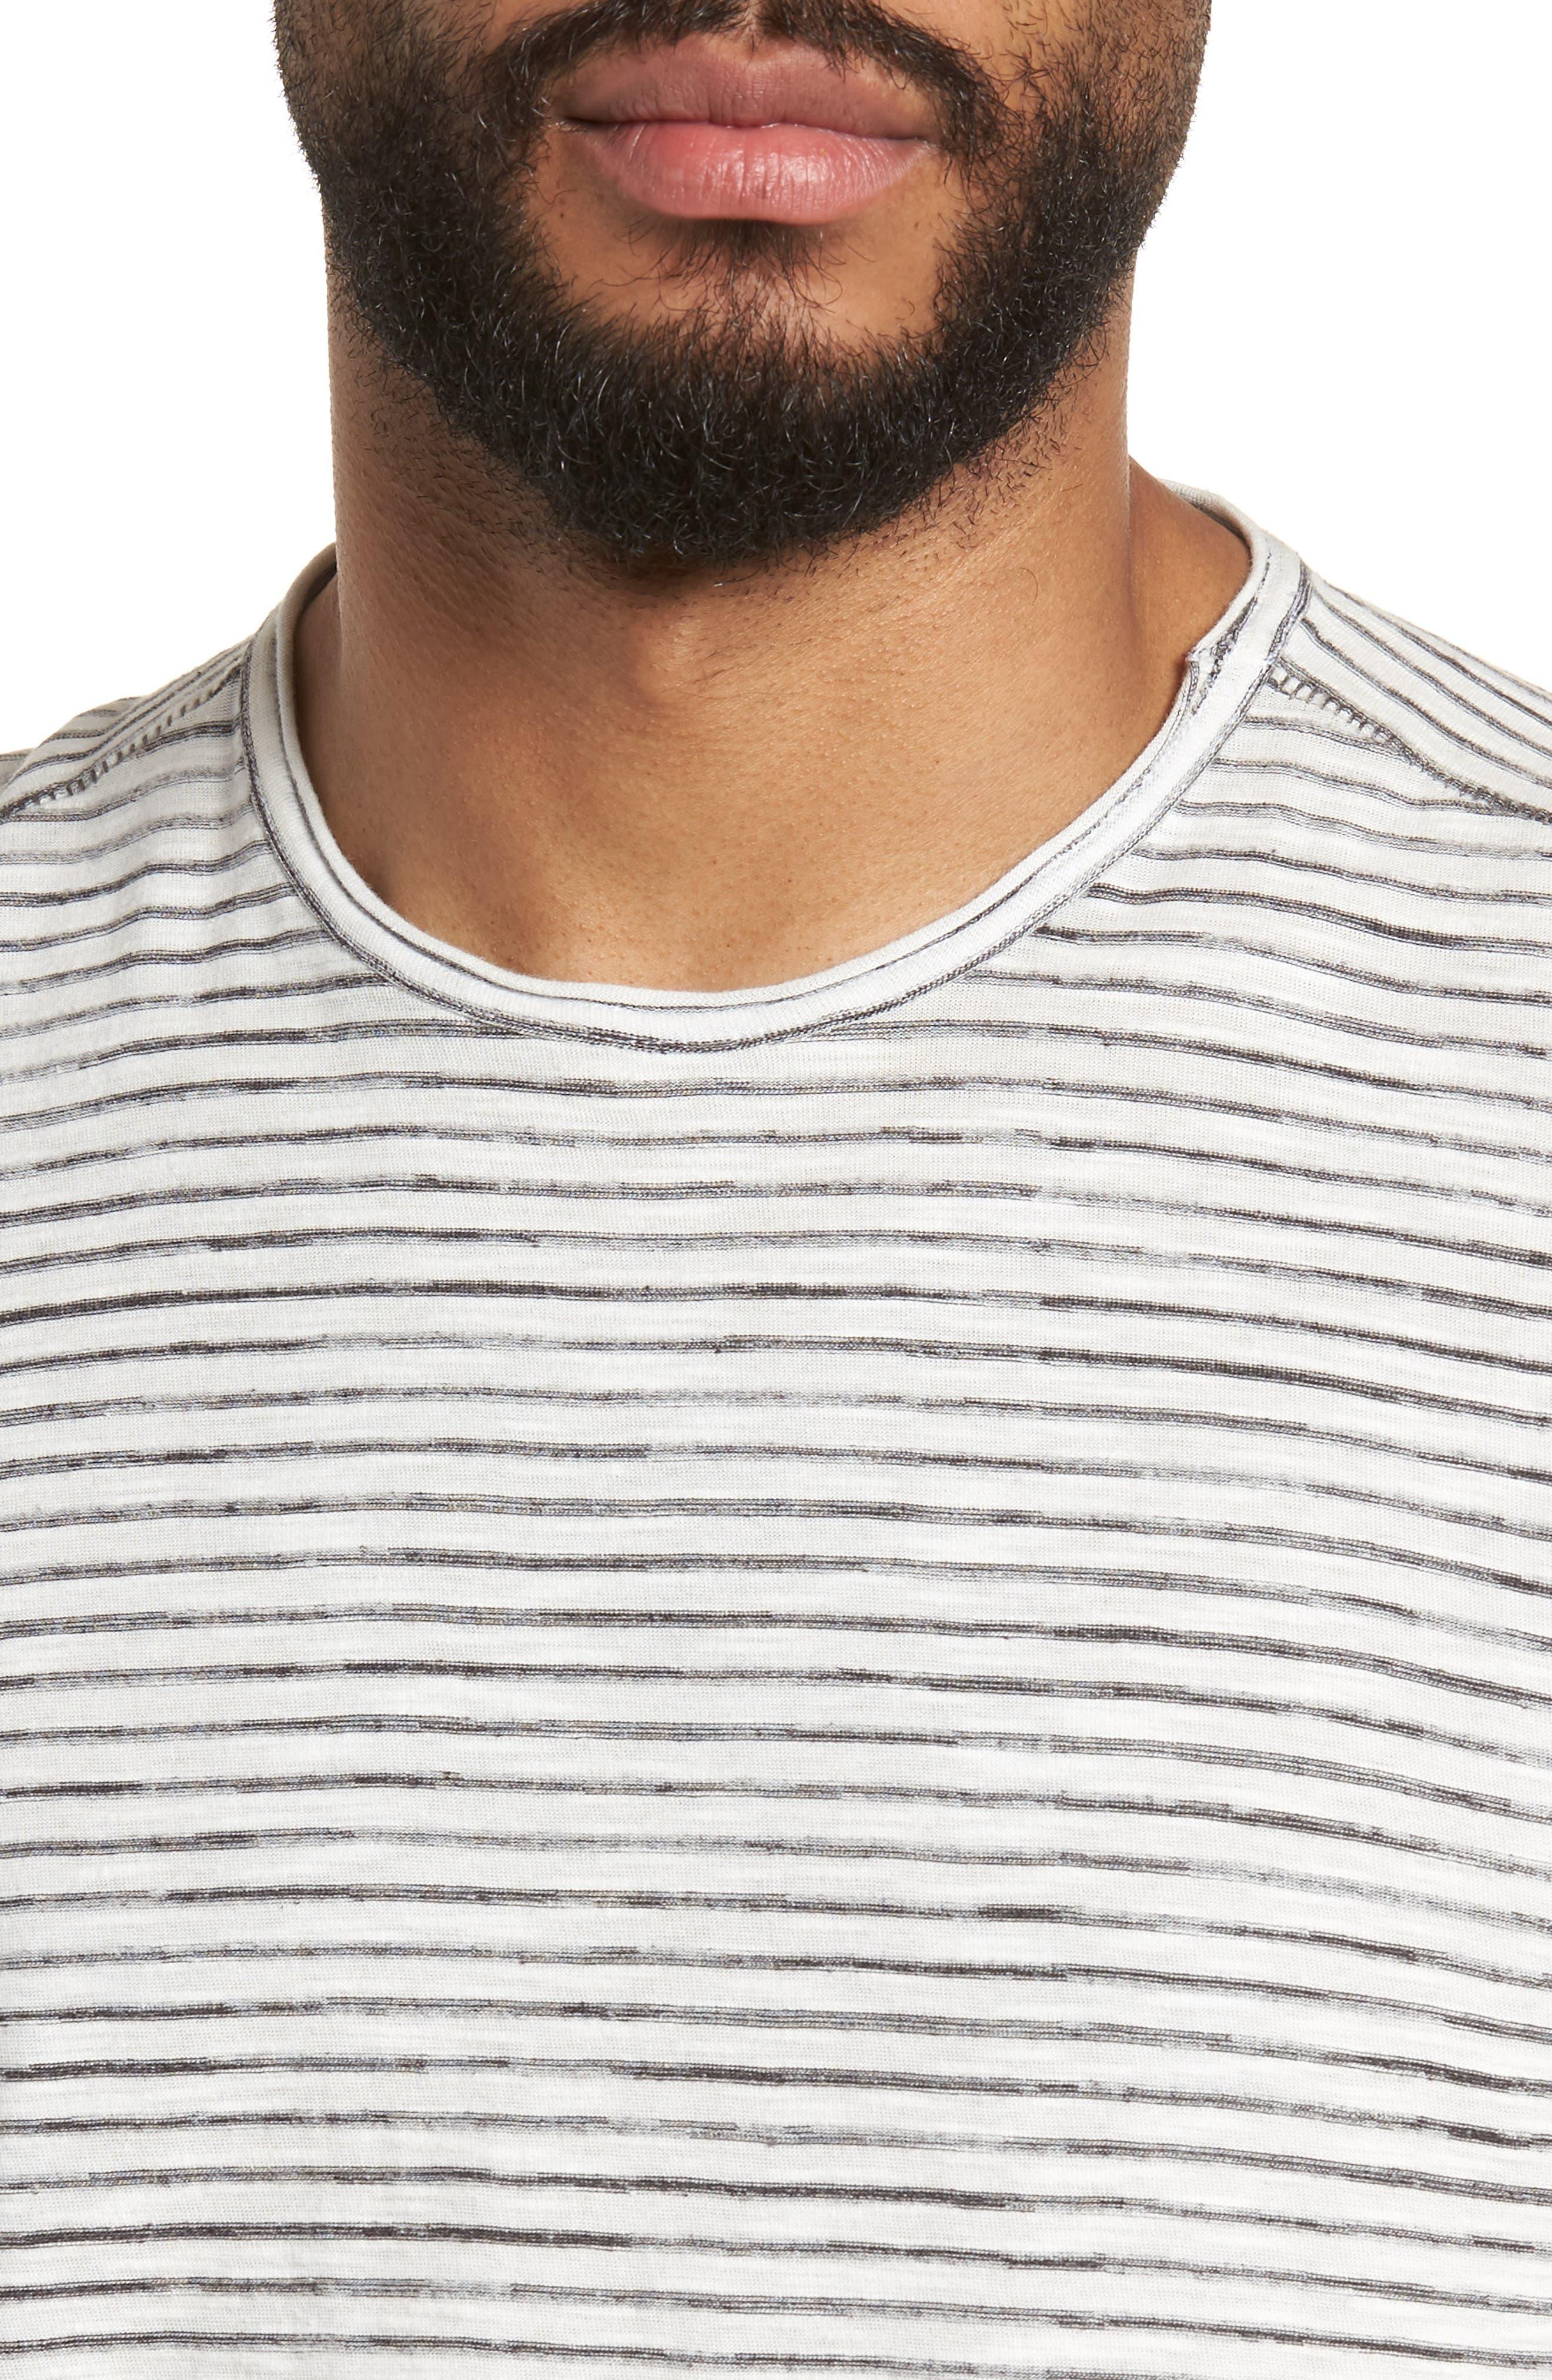 Slim Fit T-Shirt,                             Alternate thumbnail 4, color,                             White